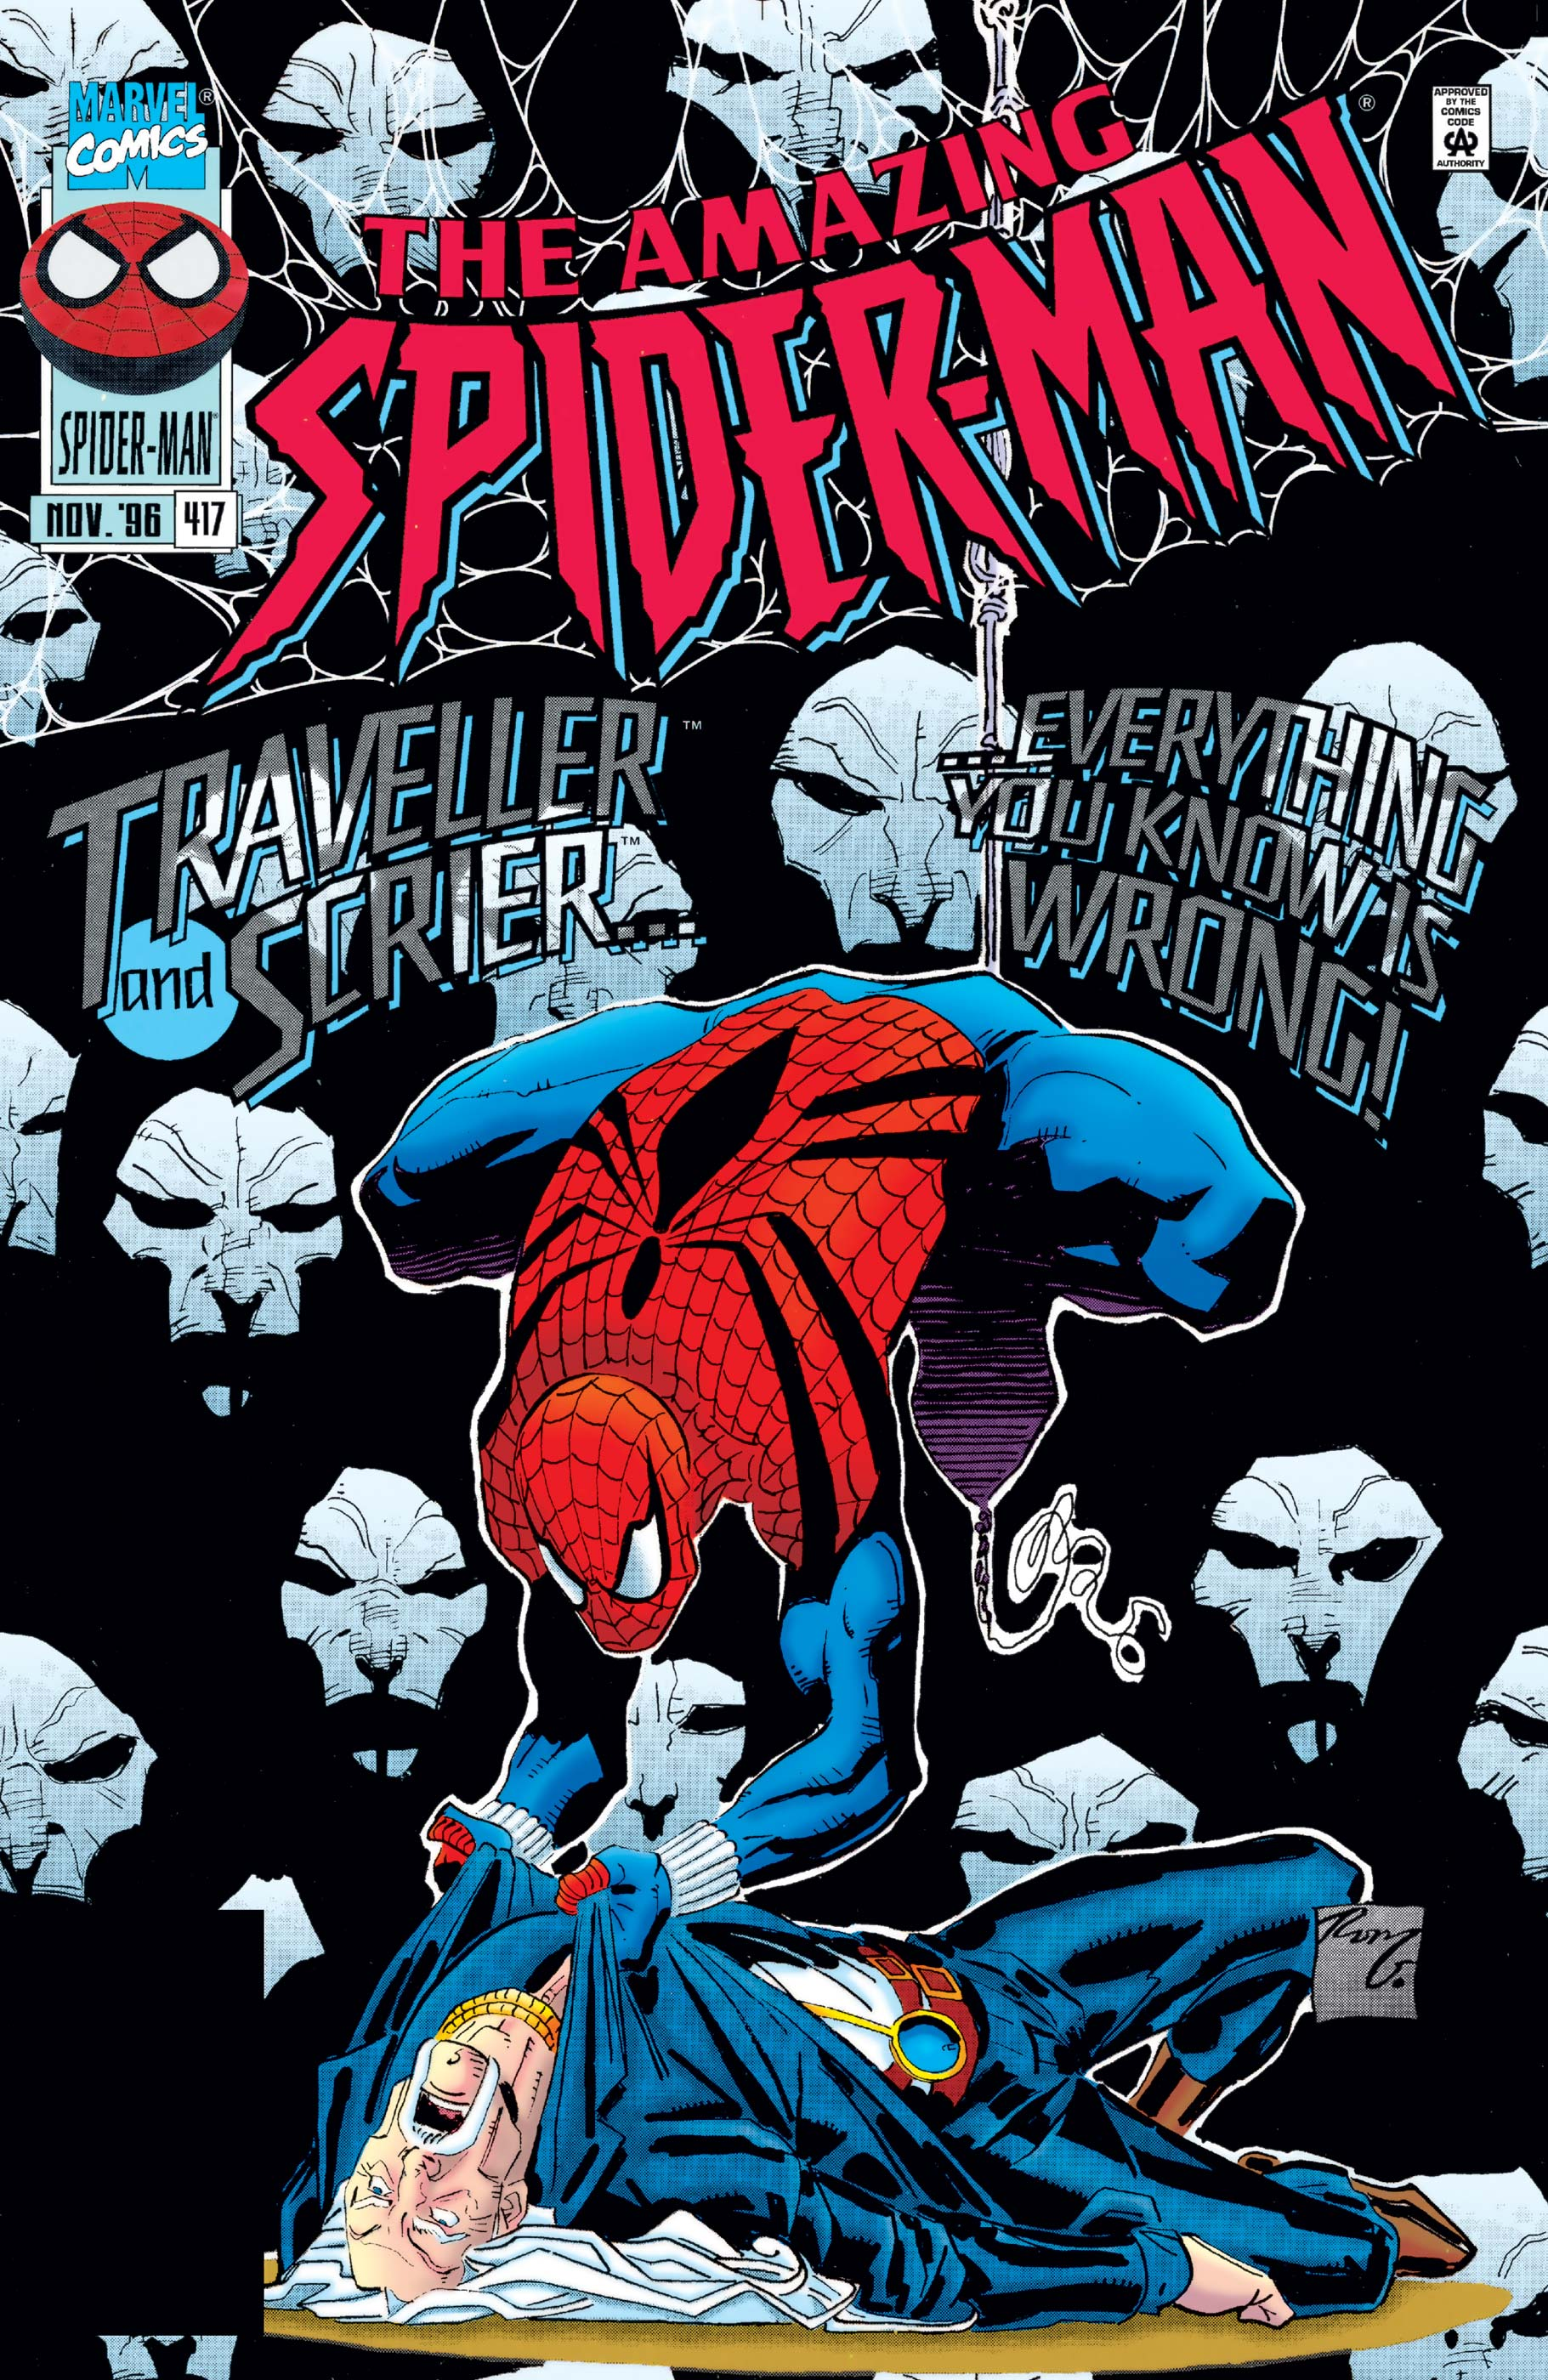 The Amazing Spider-Man (1963) #417